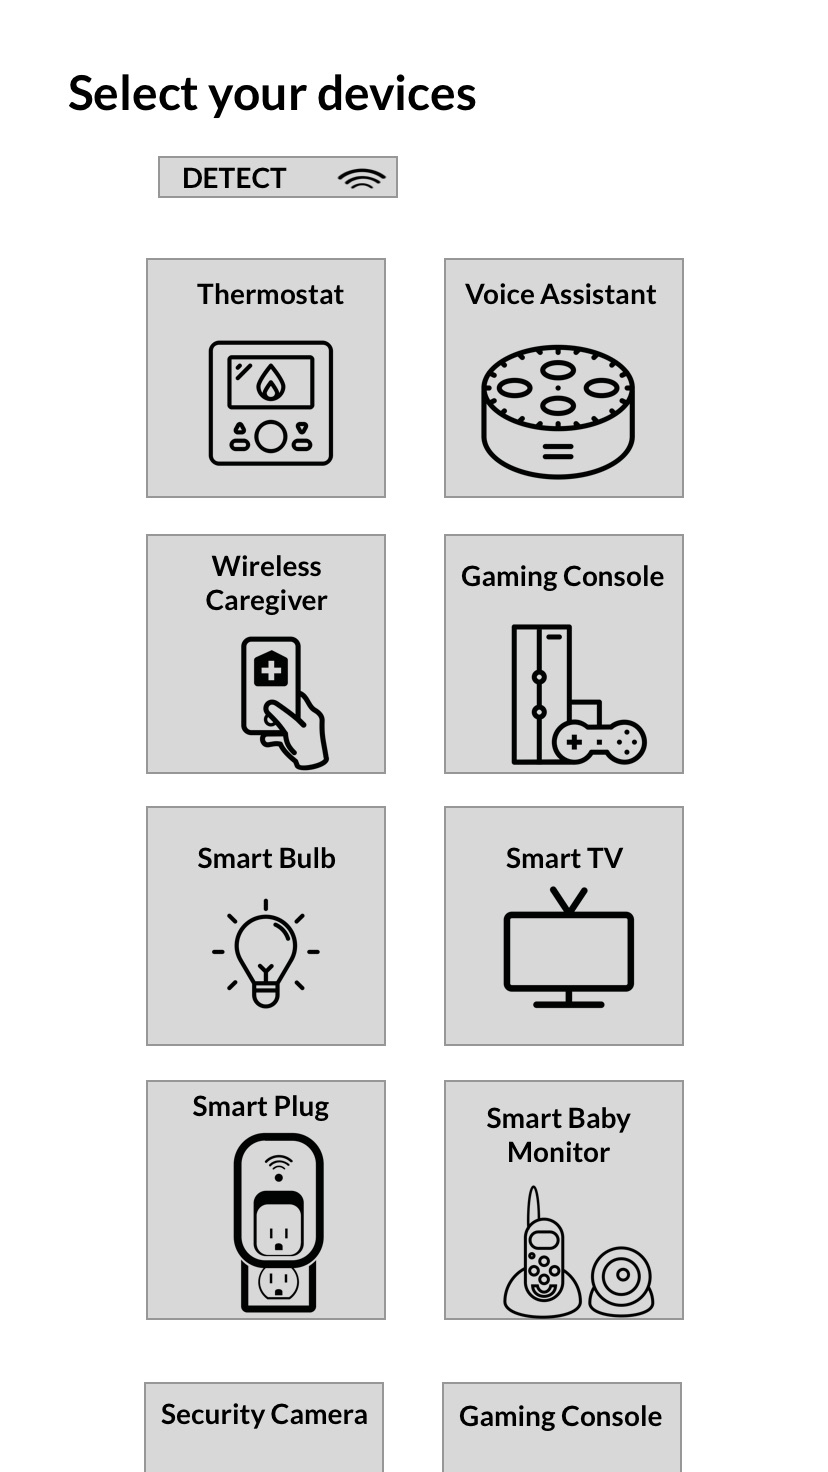 Devices_1@2x.jpg